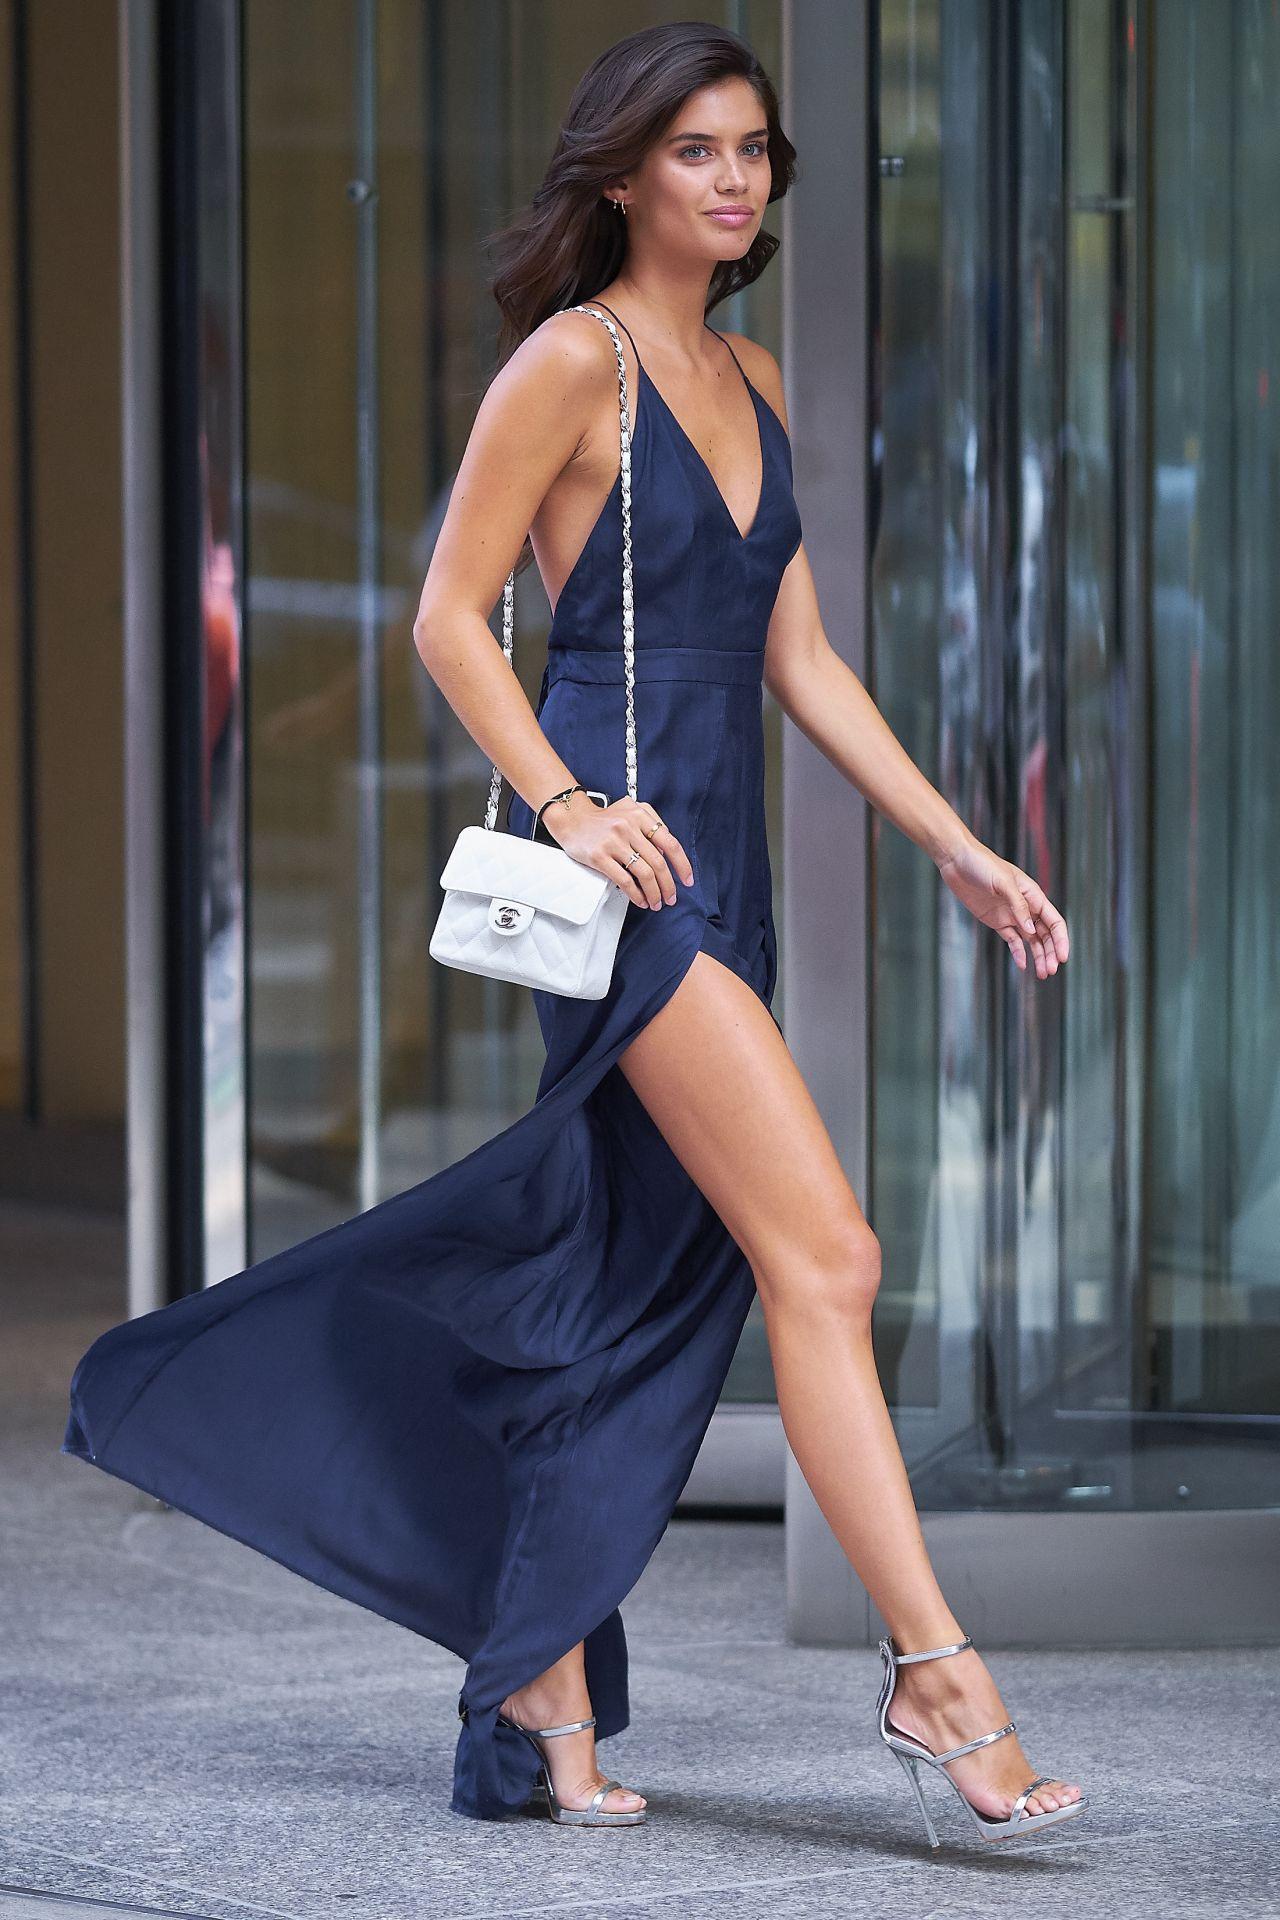 Sara Sampaio Street Fashion Fittings For The Victoria Secret Fashion Show In Nyc 08 27 2017